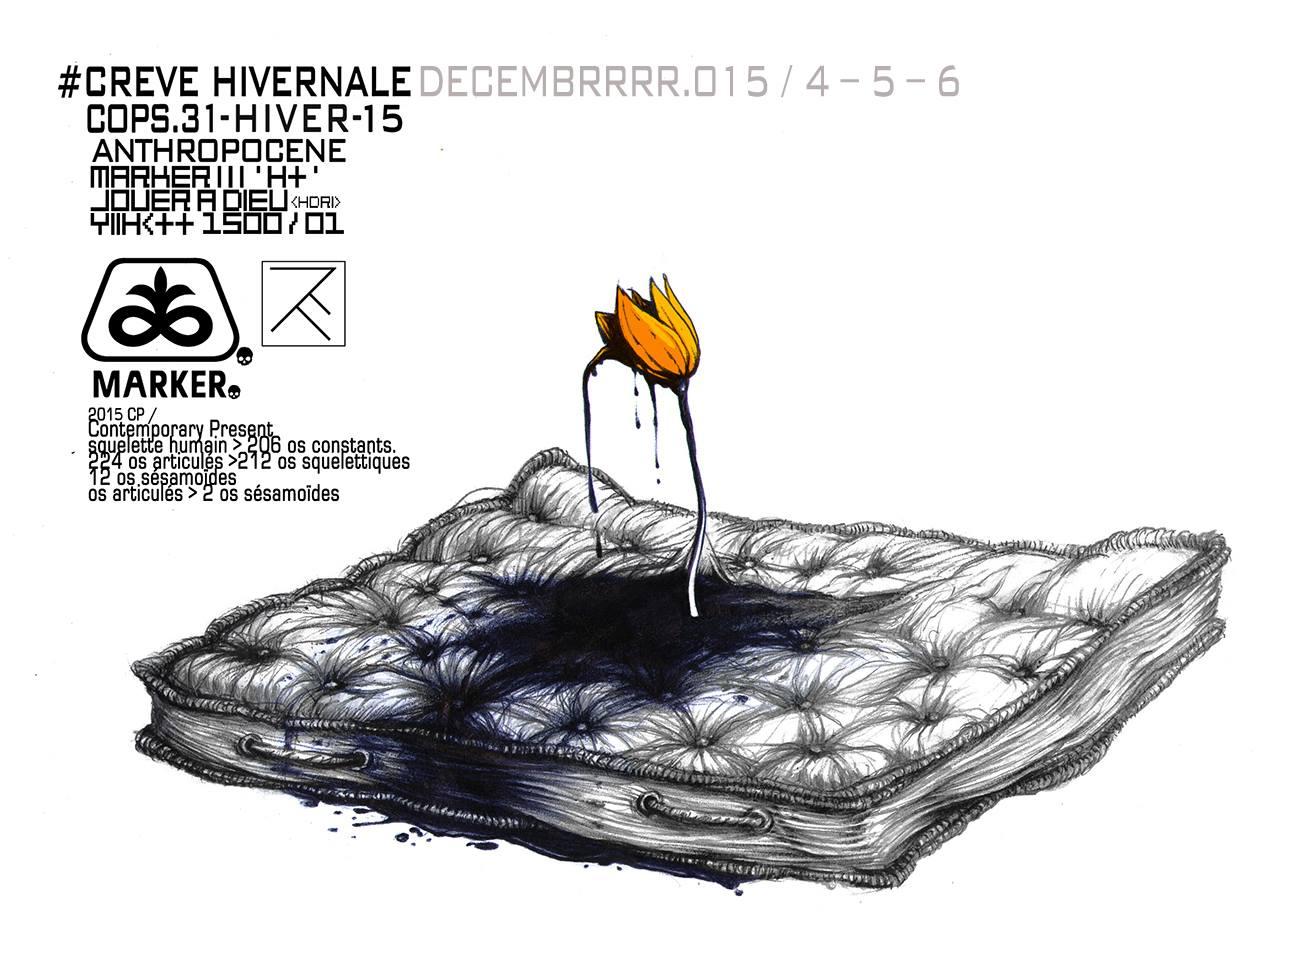 Creve Hivernale Flyer 02